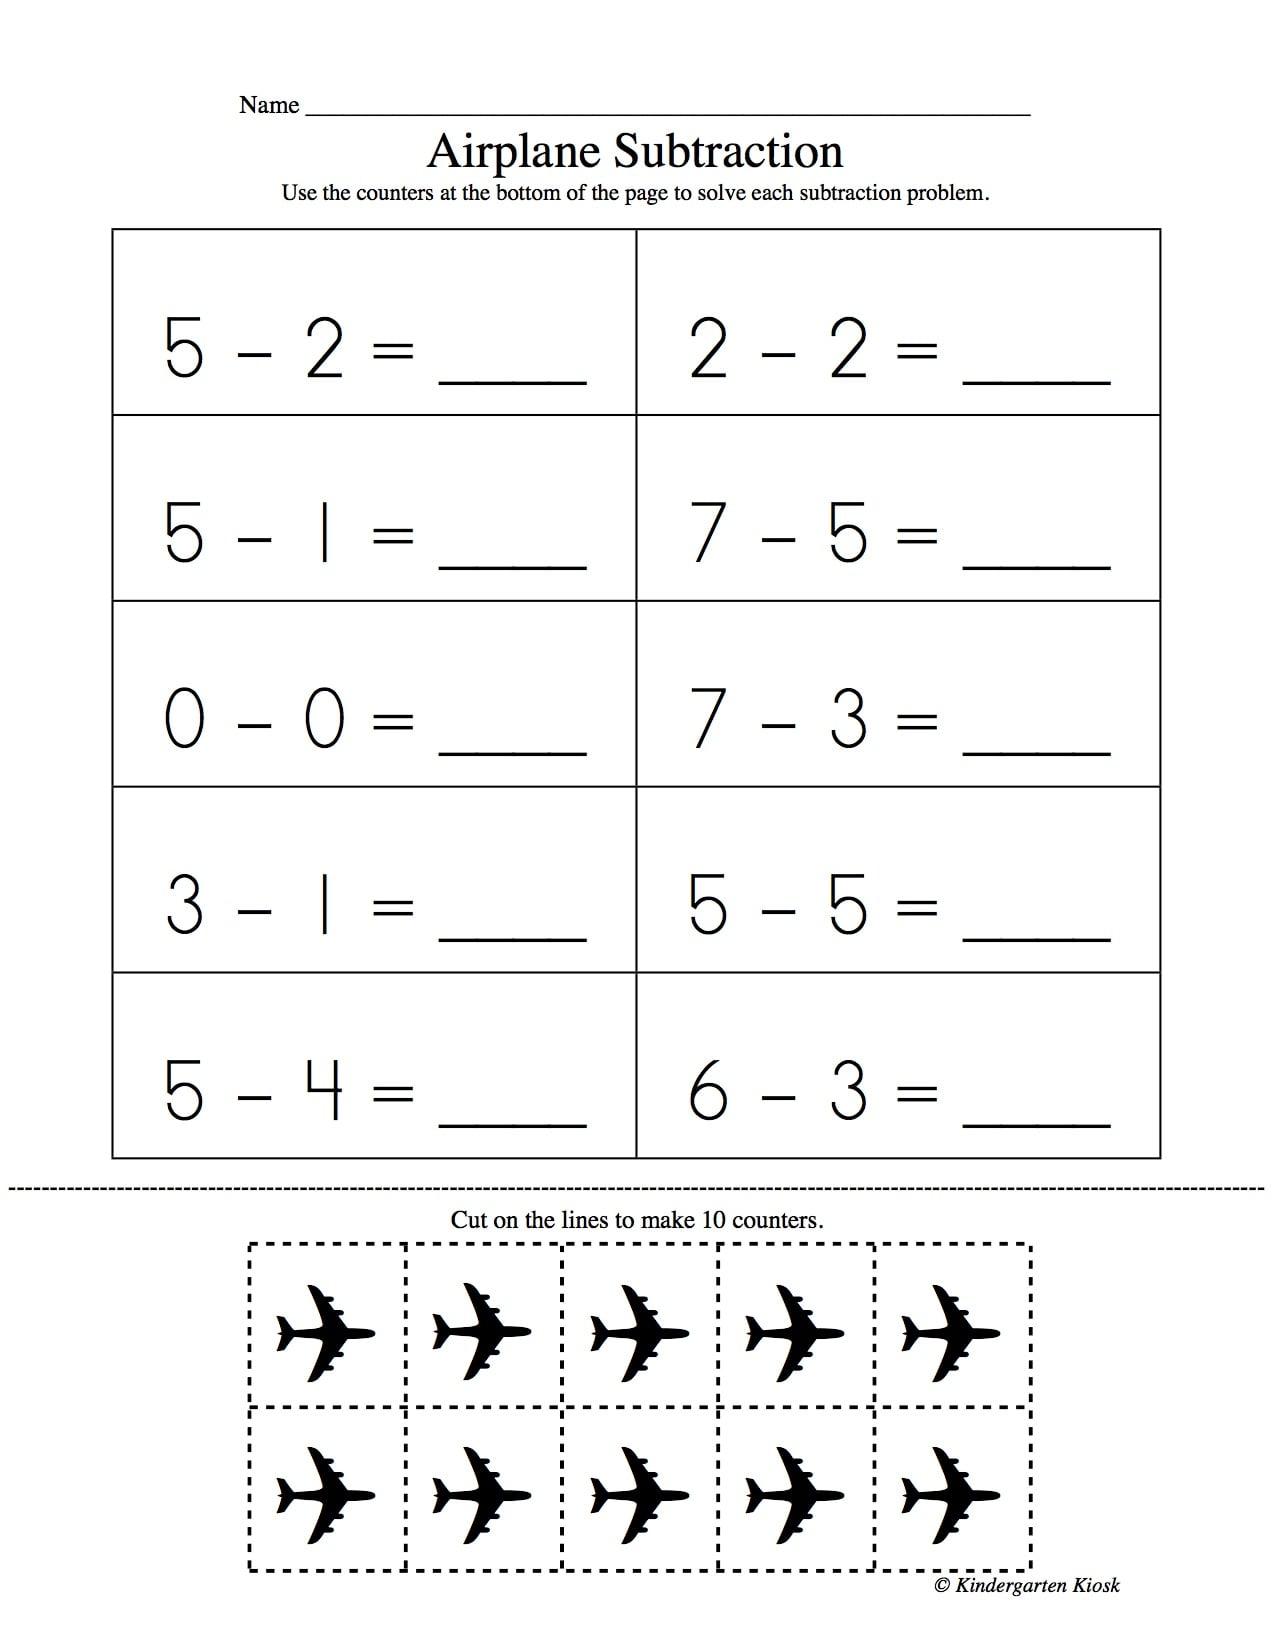 small resolution of Subtraction Worksheets for Kindergarten — Kindergarten Kiosk